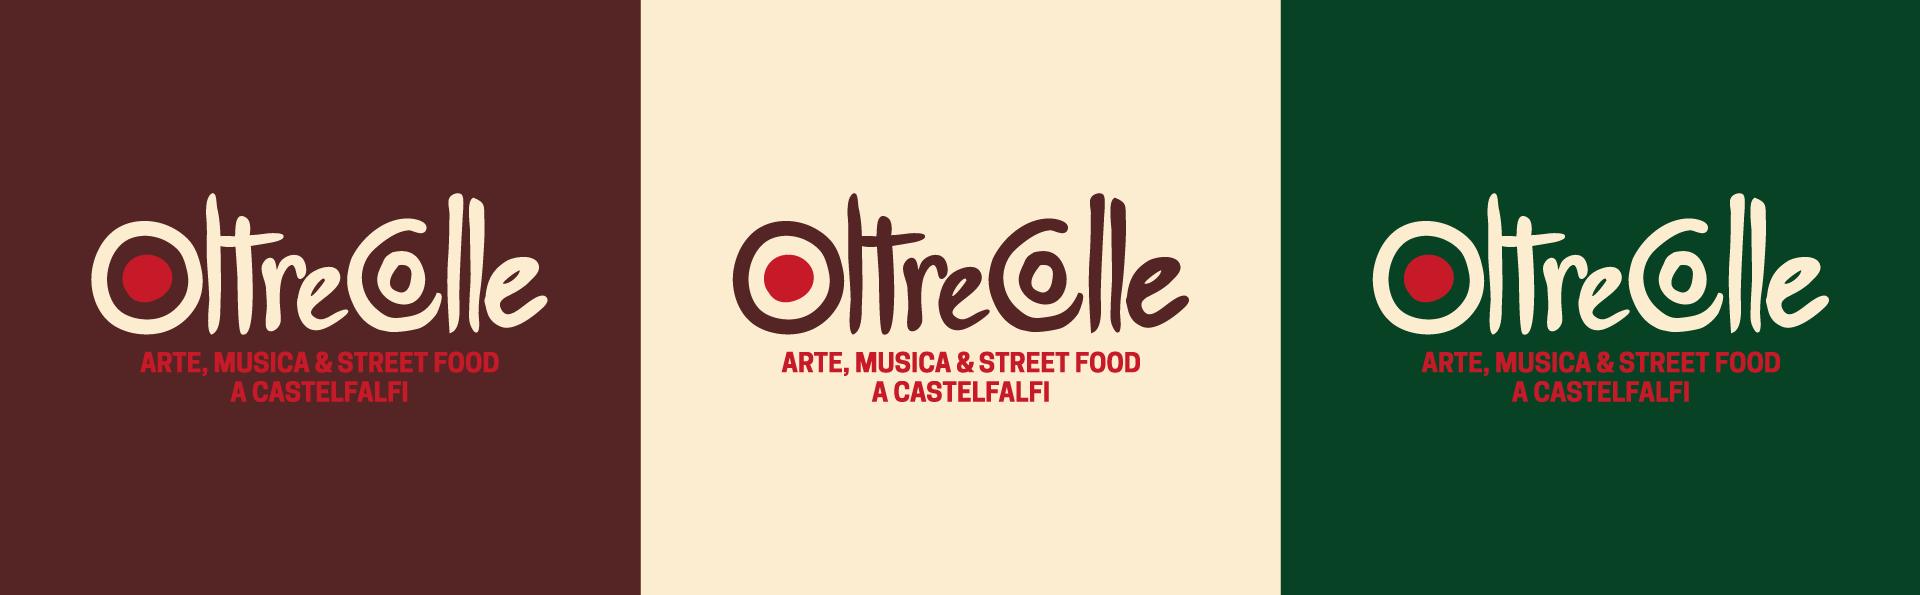 Oltrecollle-Festival-Logo-Colors-Zerouno-Design